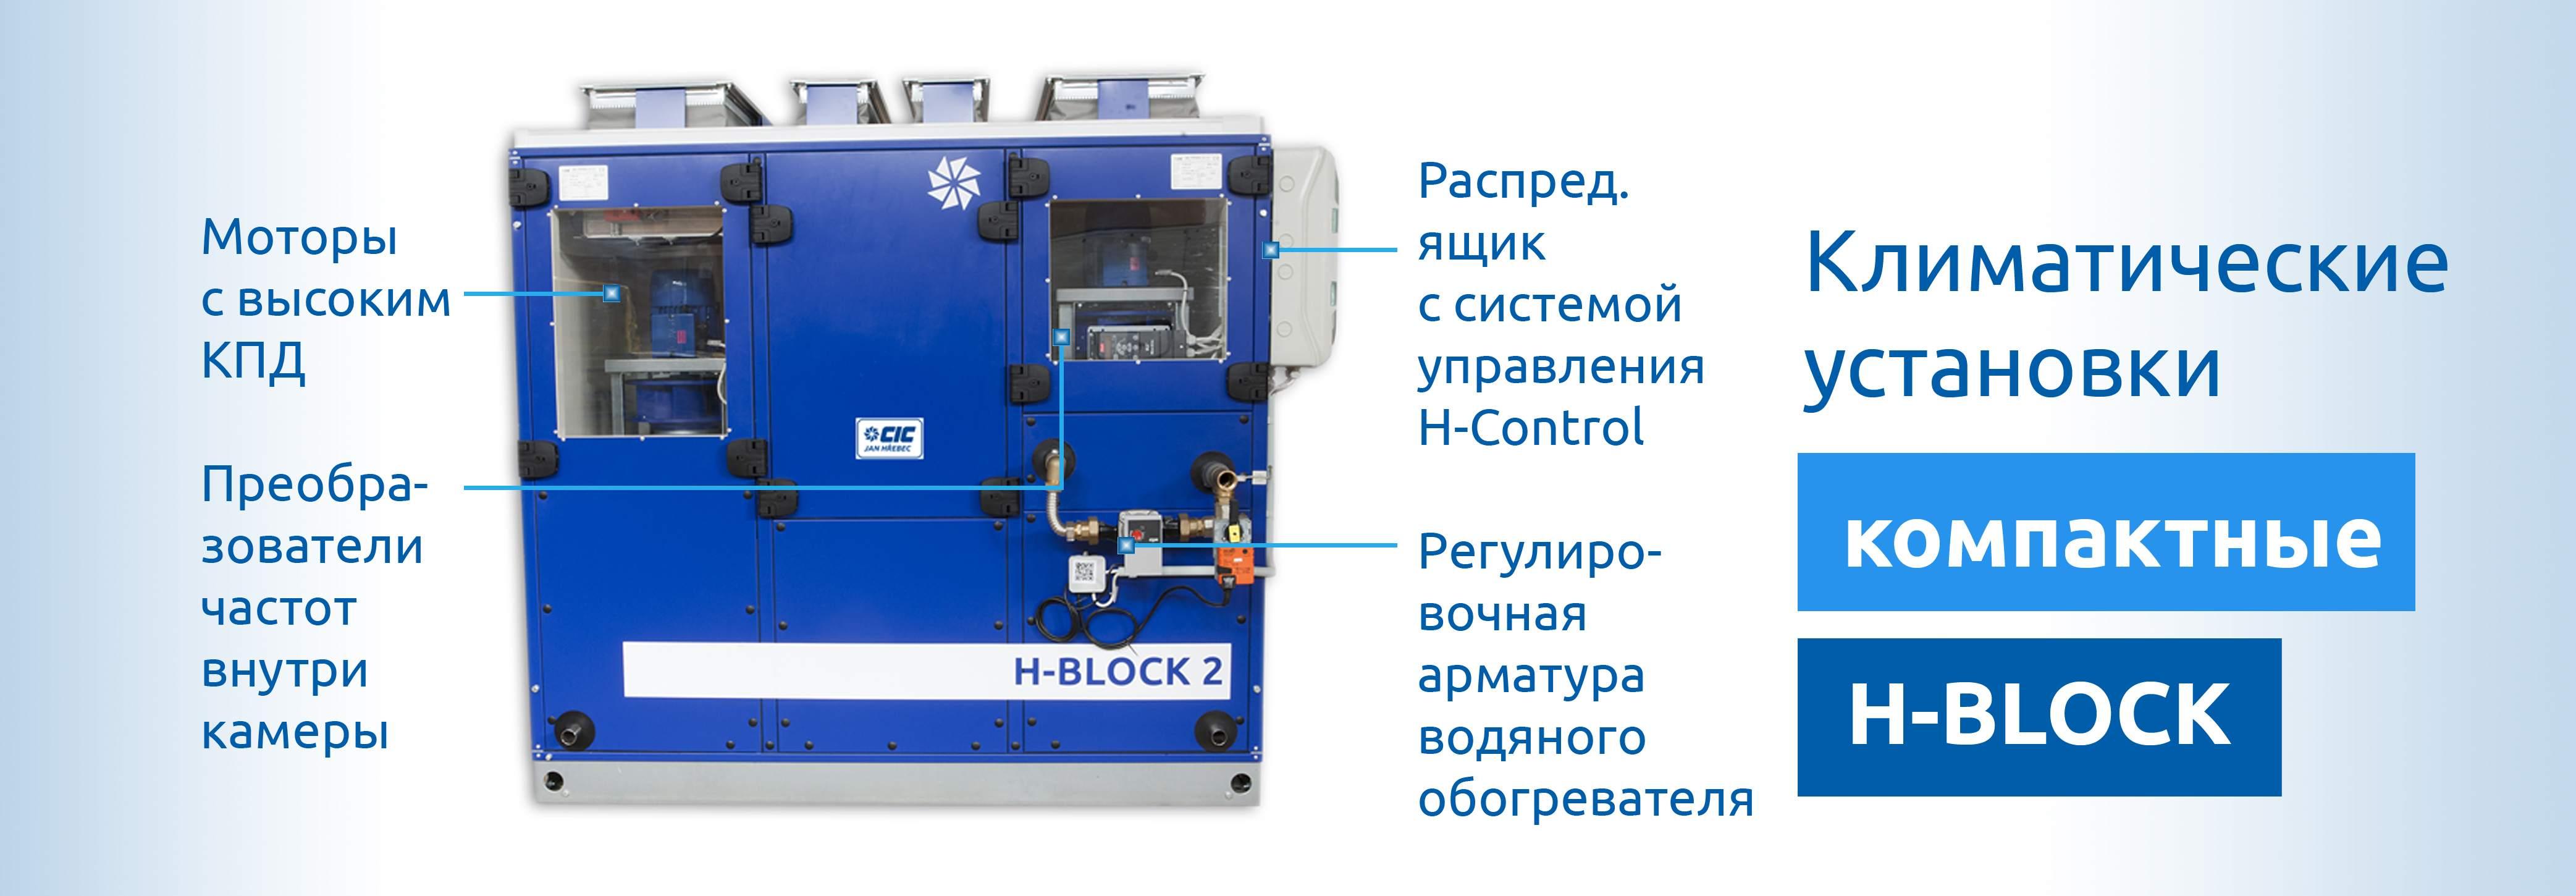 H_BLOCK